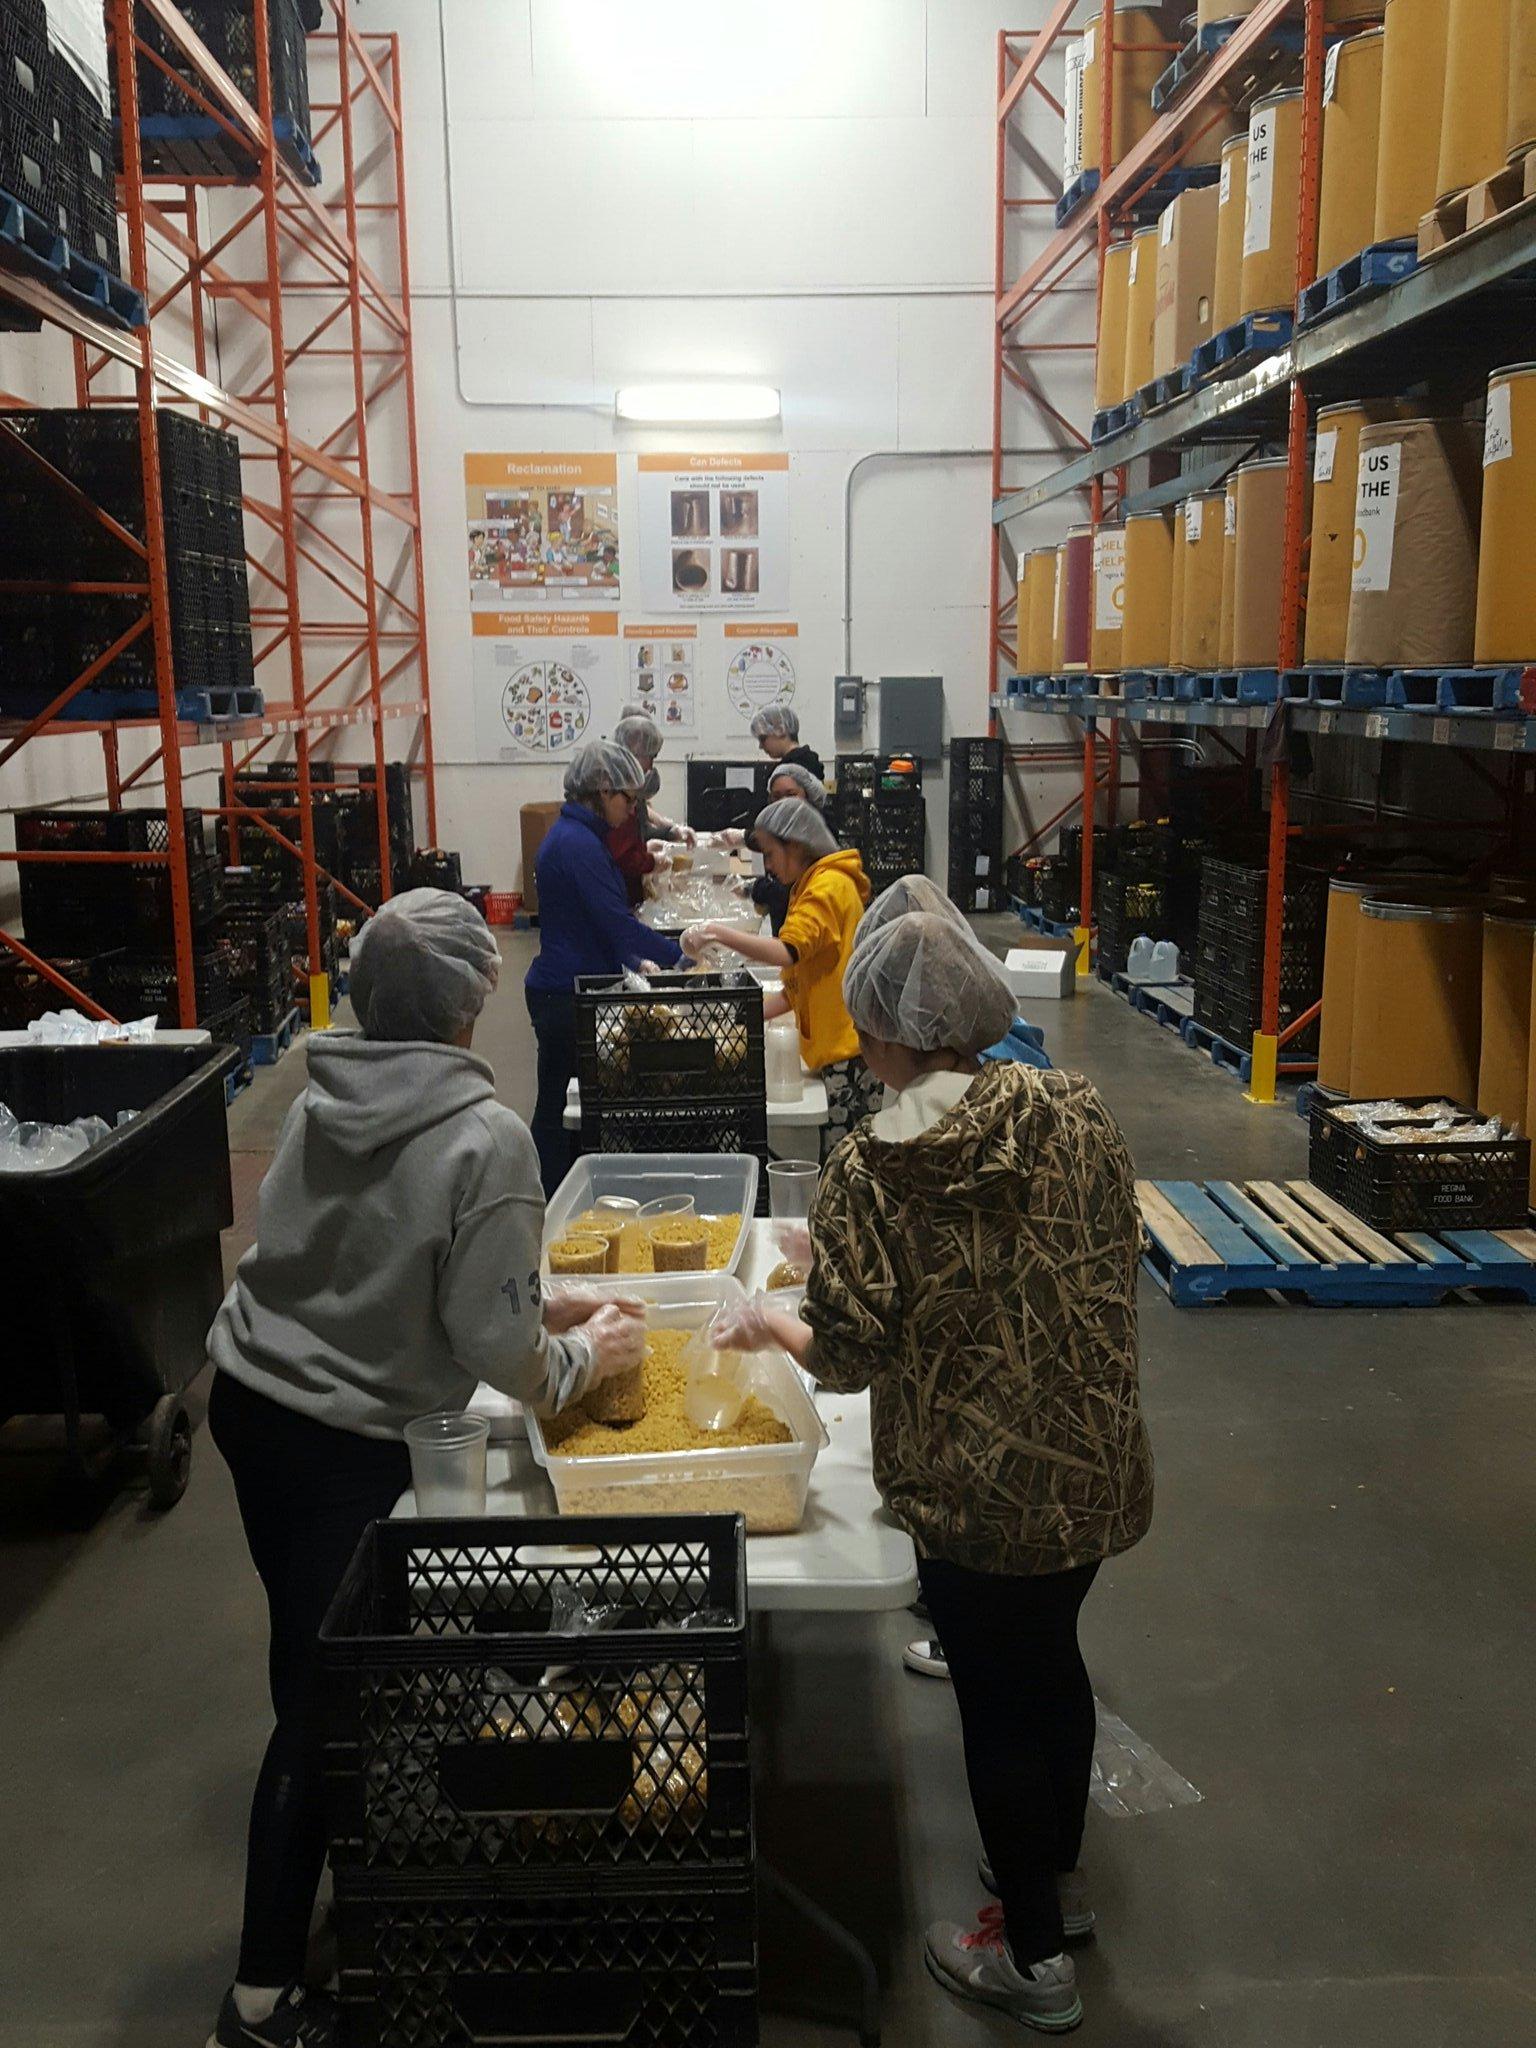 Portioning pasta like it's their day job! 🐝🍝 #workerbees @oneilltitans @ReginaFoodBank https://t.co/bu8Ri2C5rC